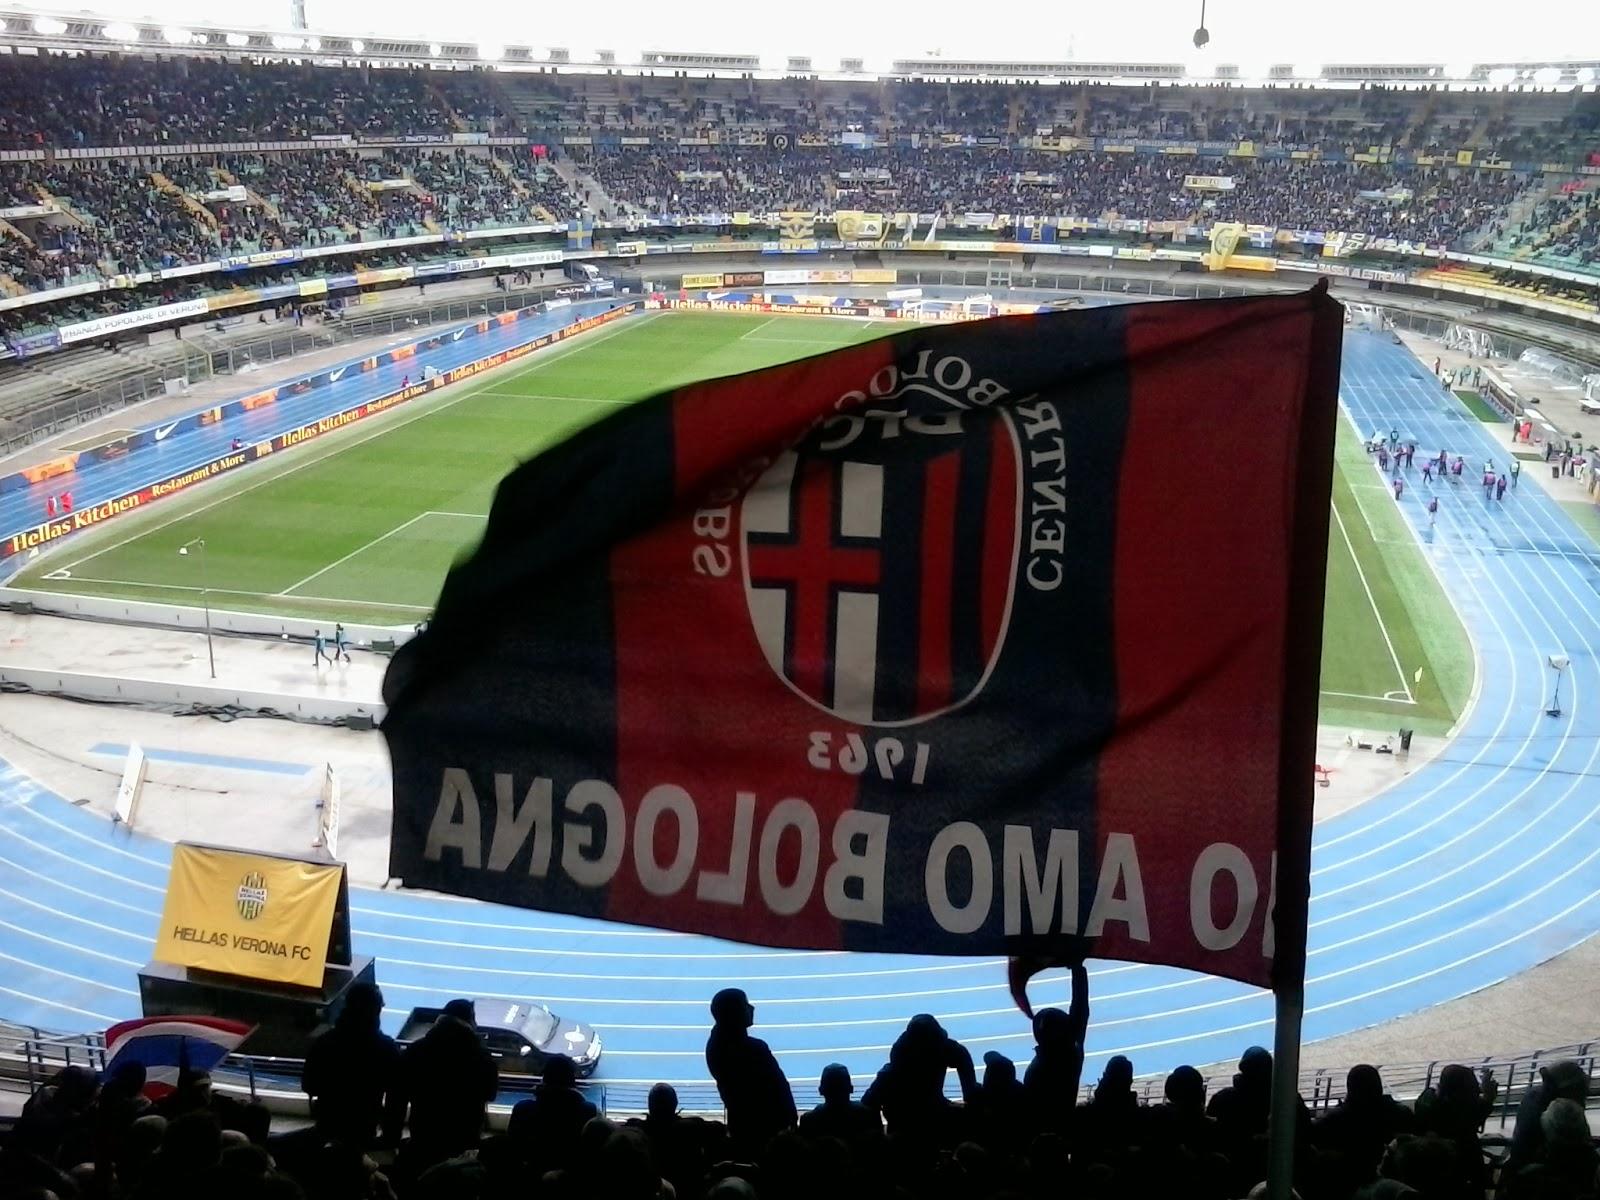 Verona-Bologna 0-0: video highlights della partita [2013/14]